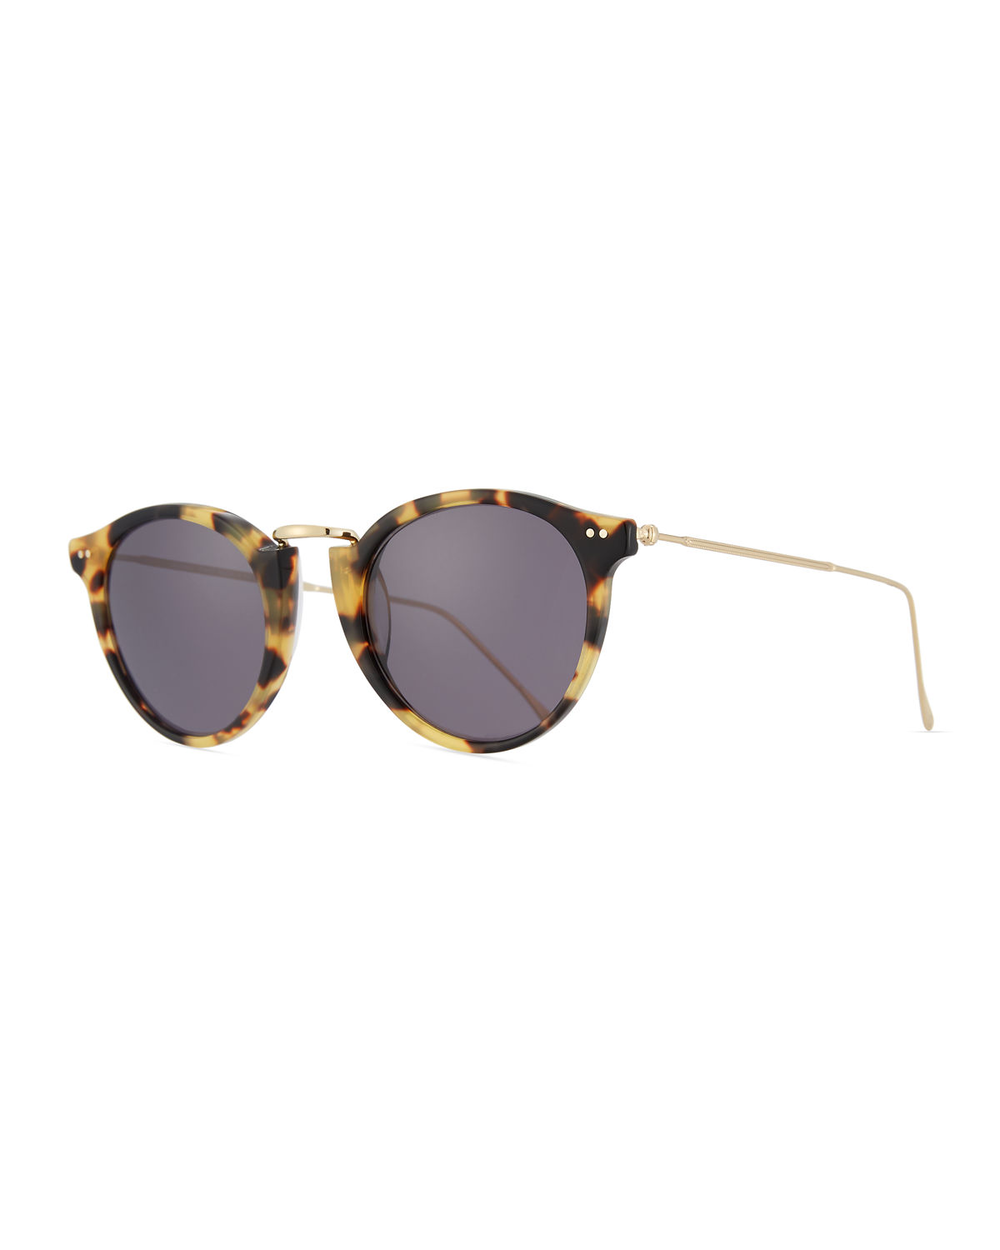 1. illesteva sunglasses -